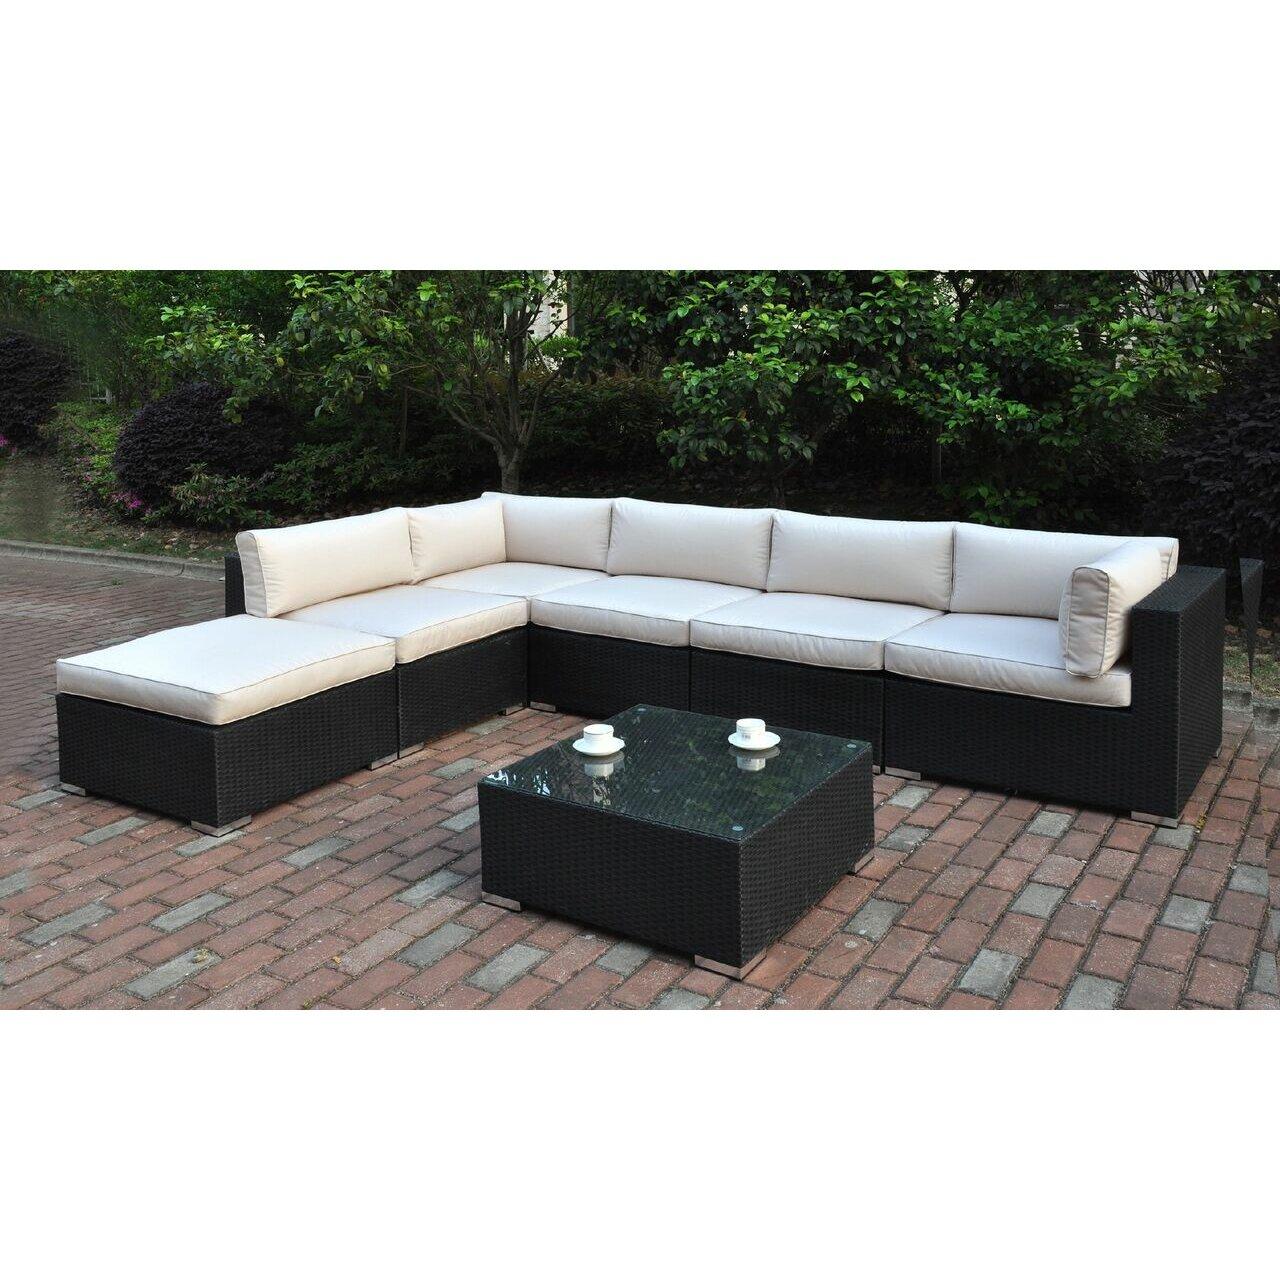 Jb patio 7 piece deep seating group with cushion wayfair for 7 piece modular sectional sofa